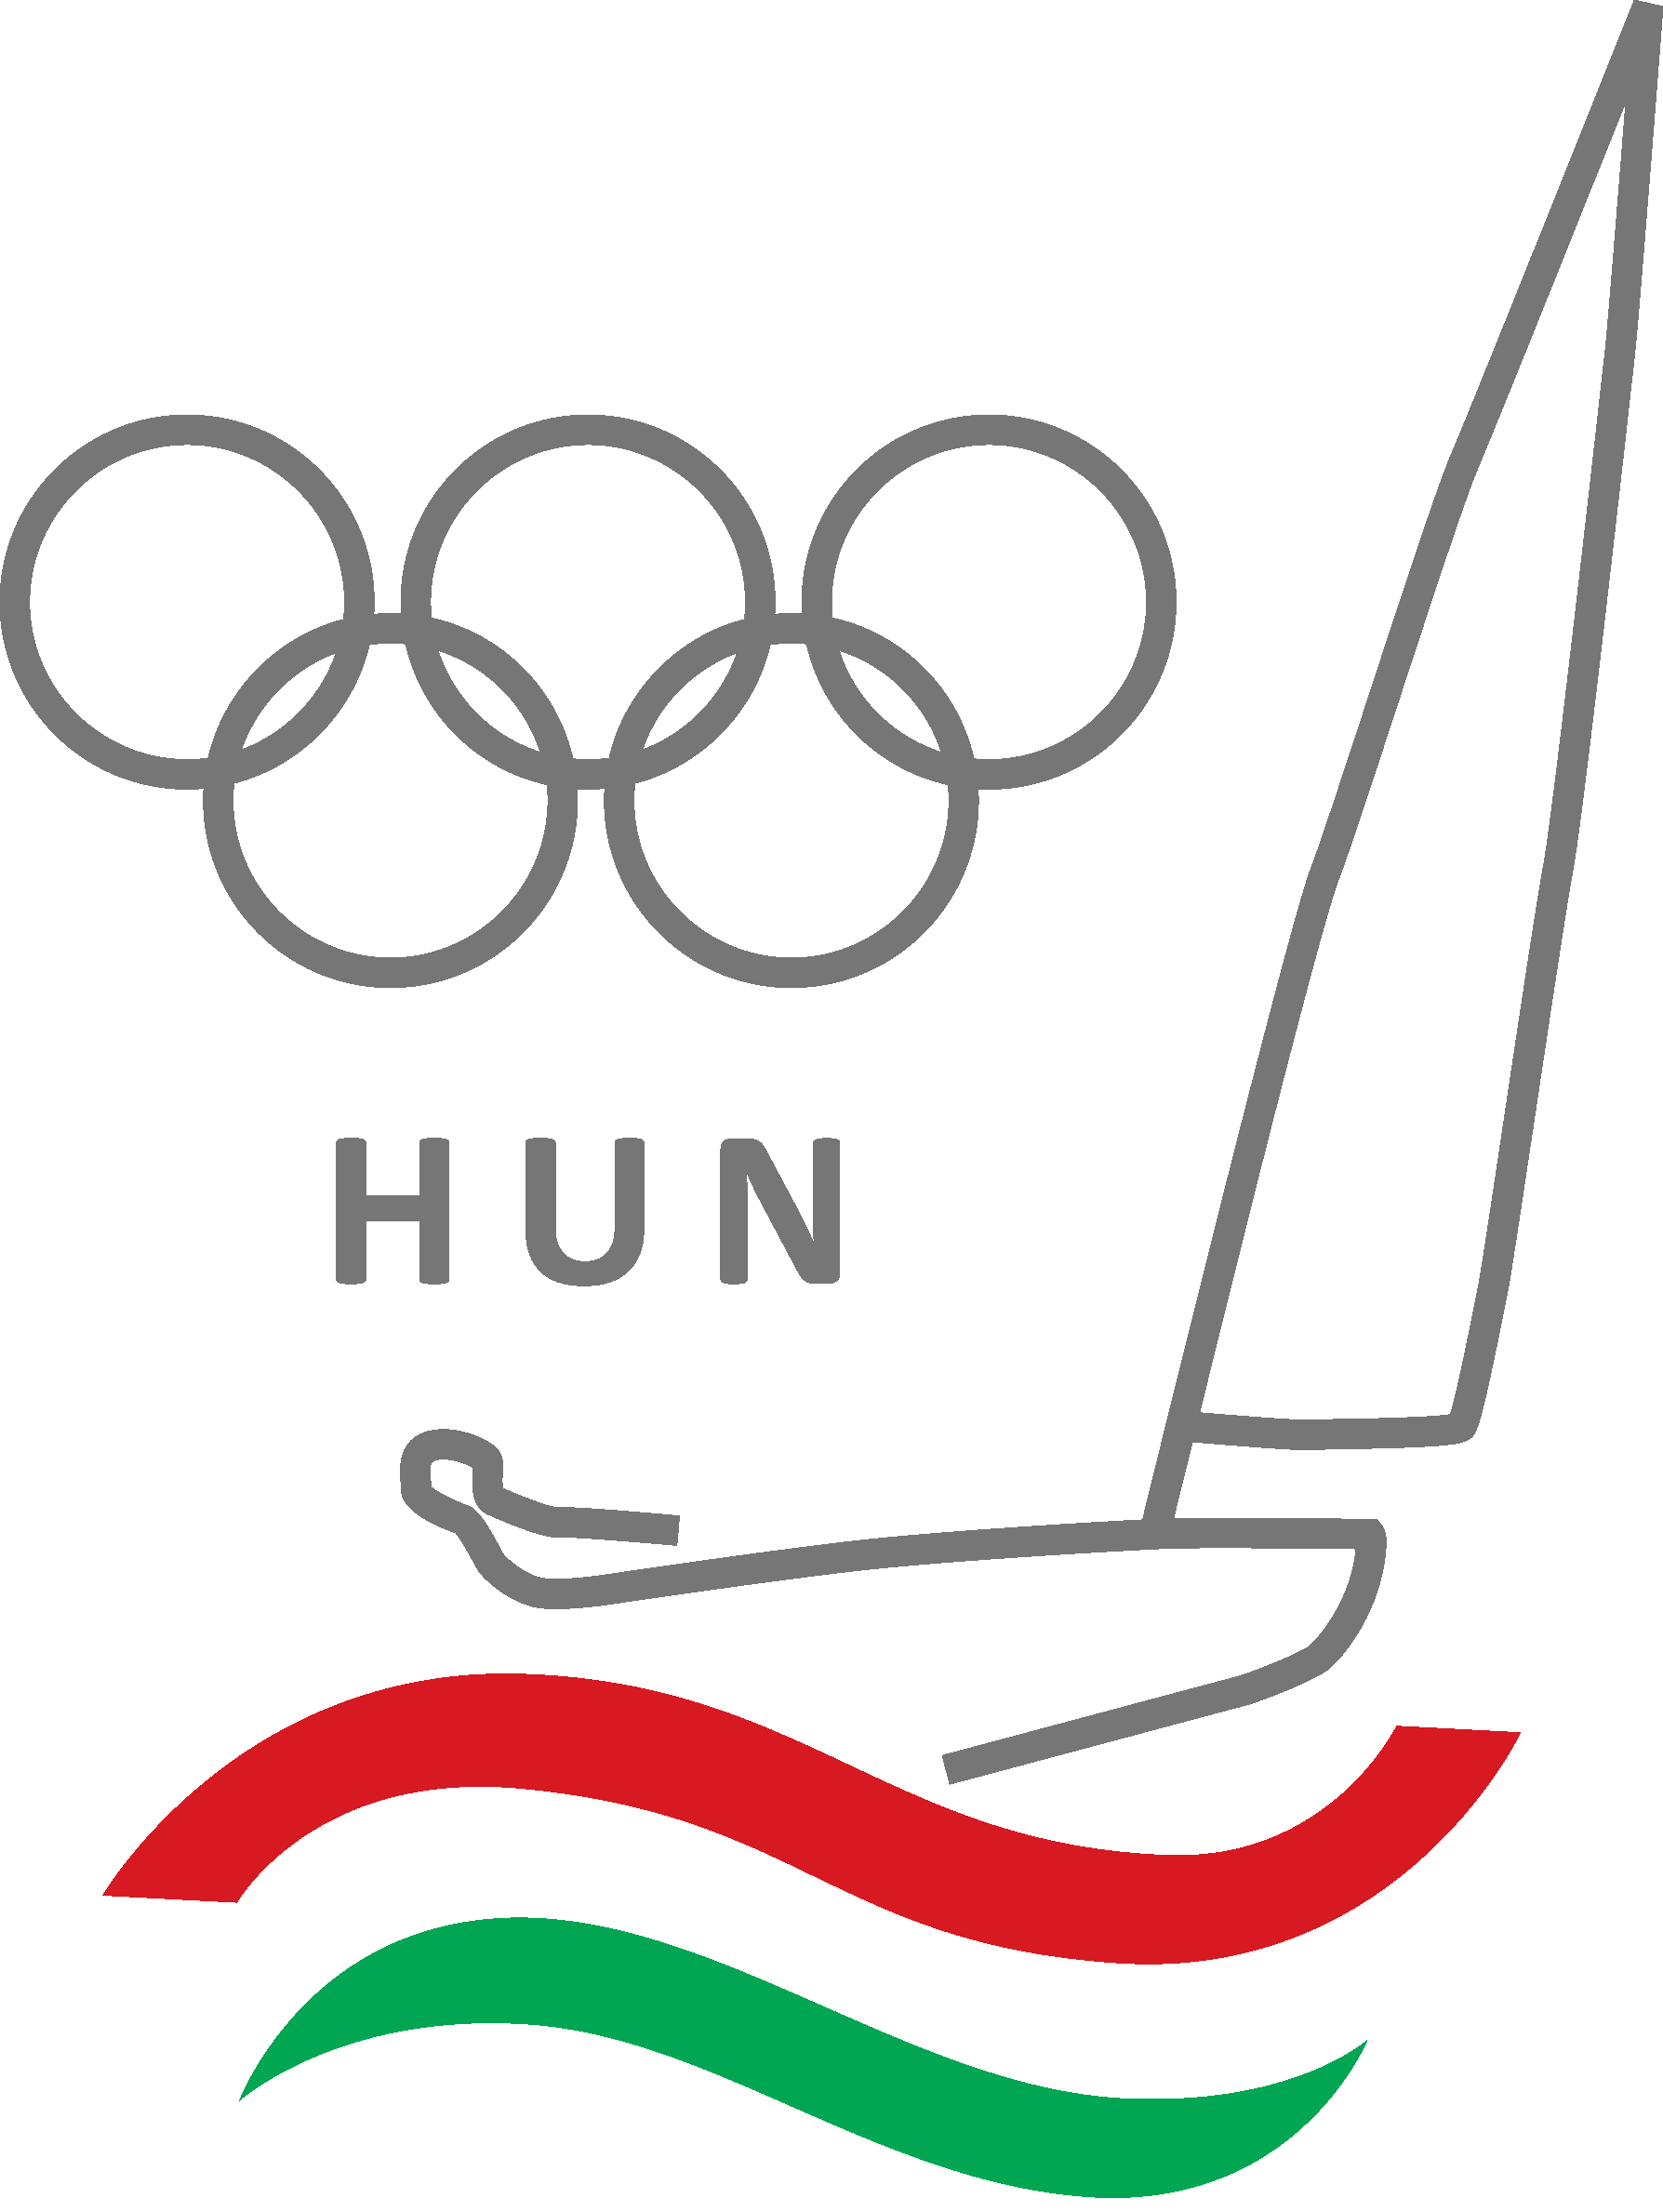 Magyar Finn-dingi Osztályszövetség – Hungarian Finn Association